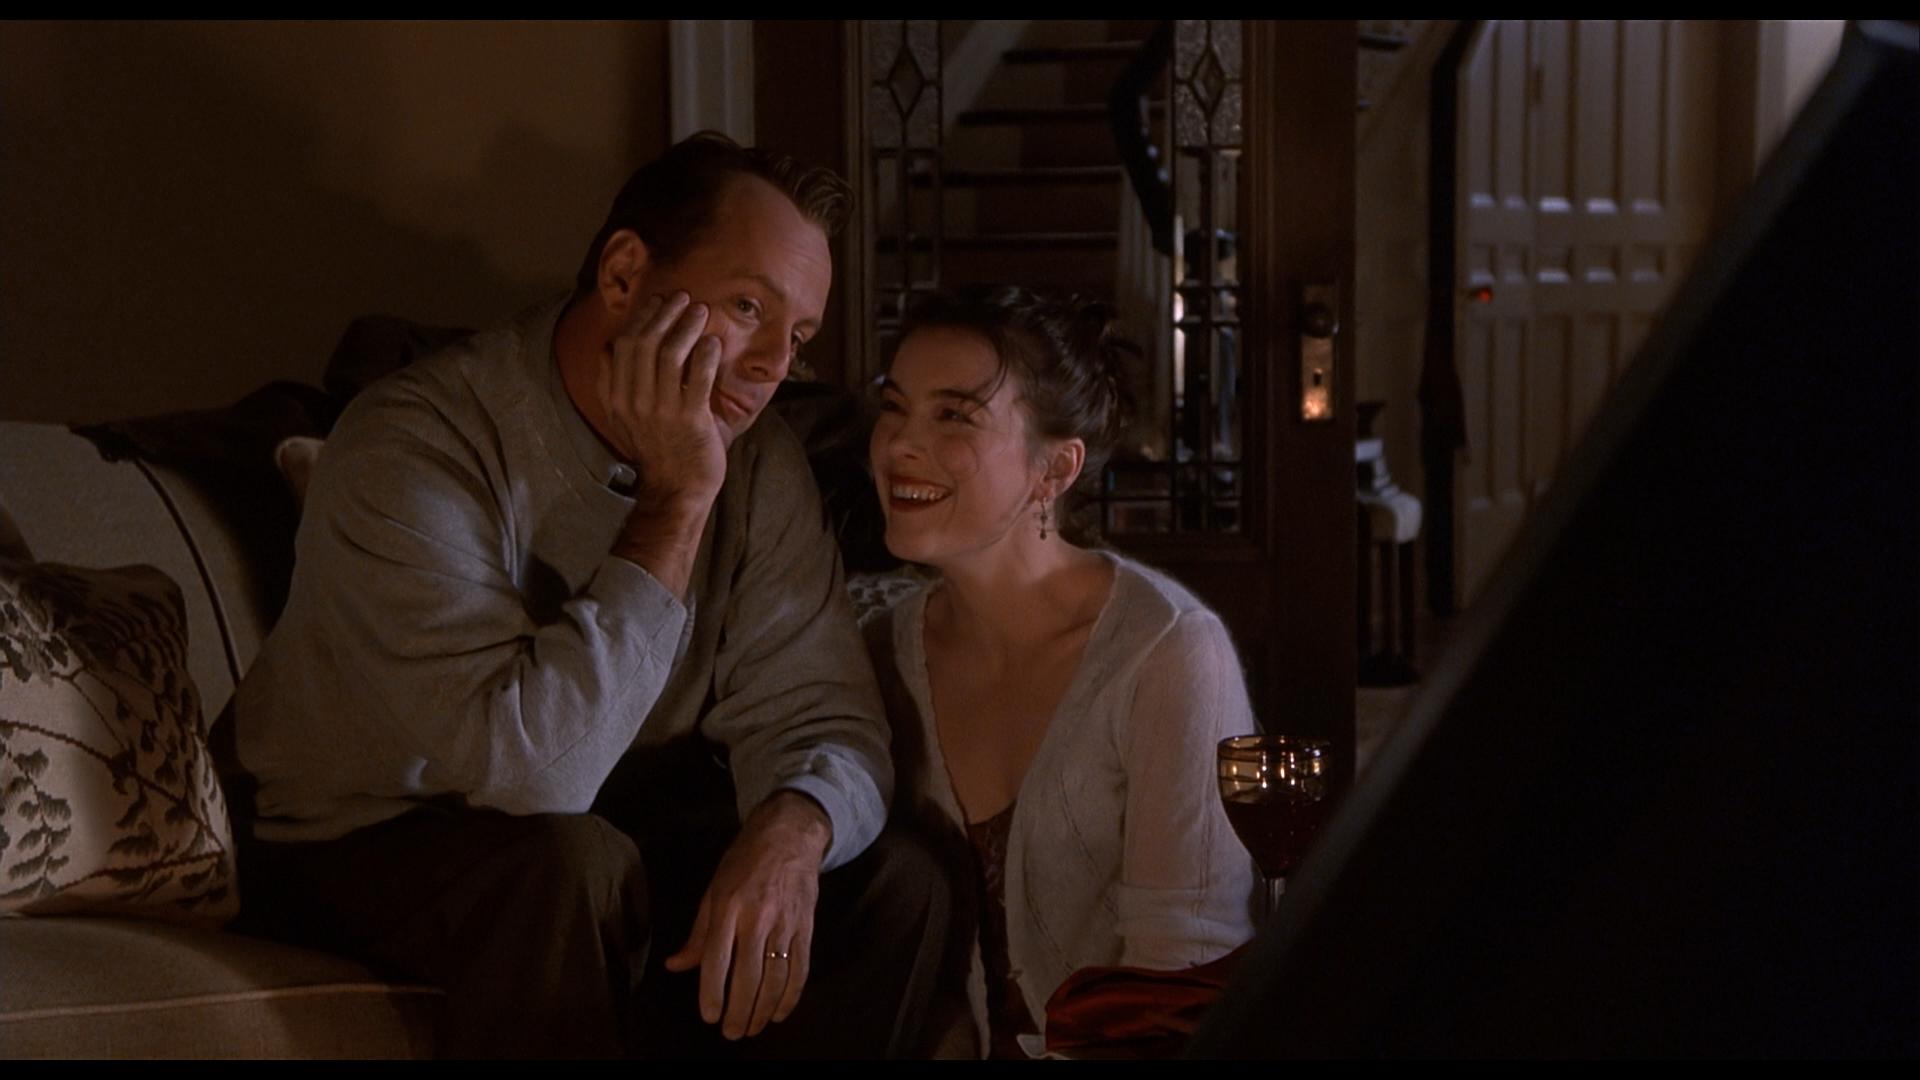 The Sixth Sense (1999), Dir. M. Night Shyamalan in 2020